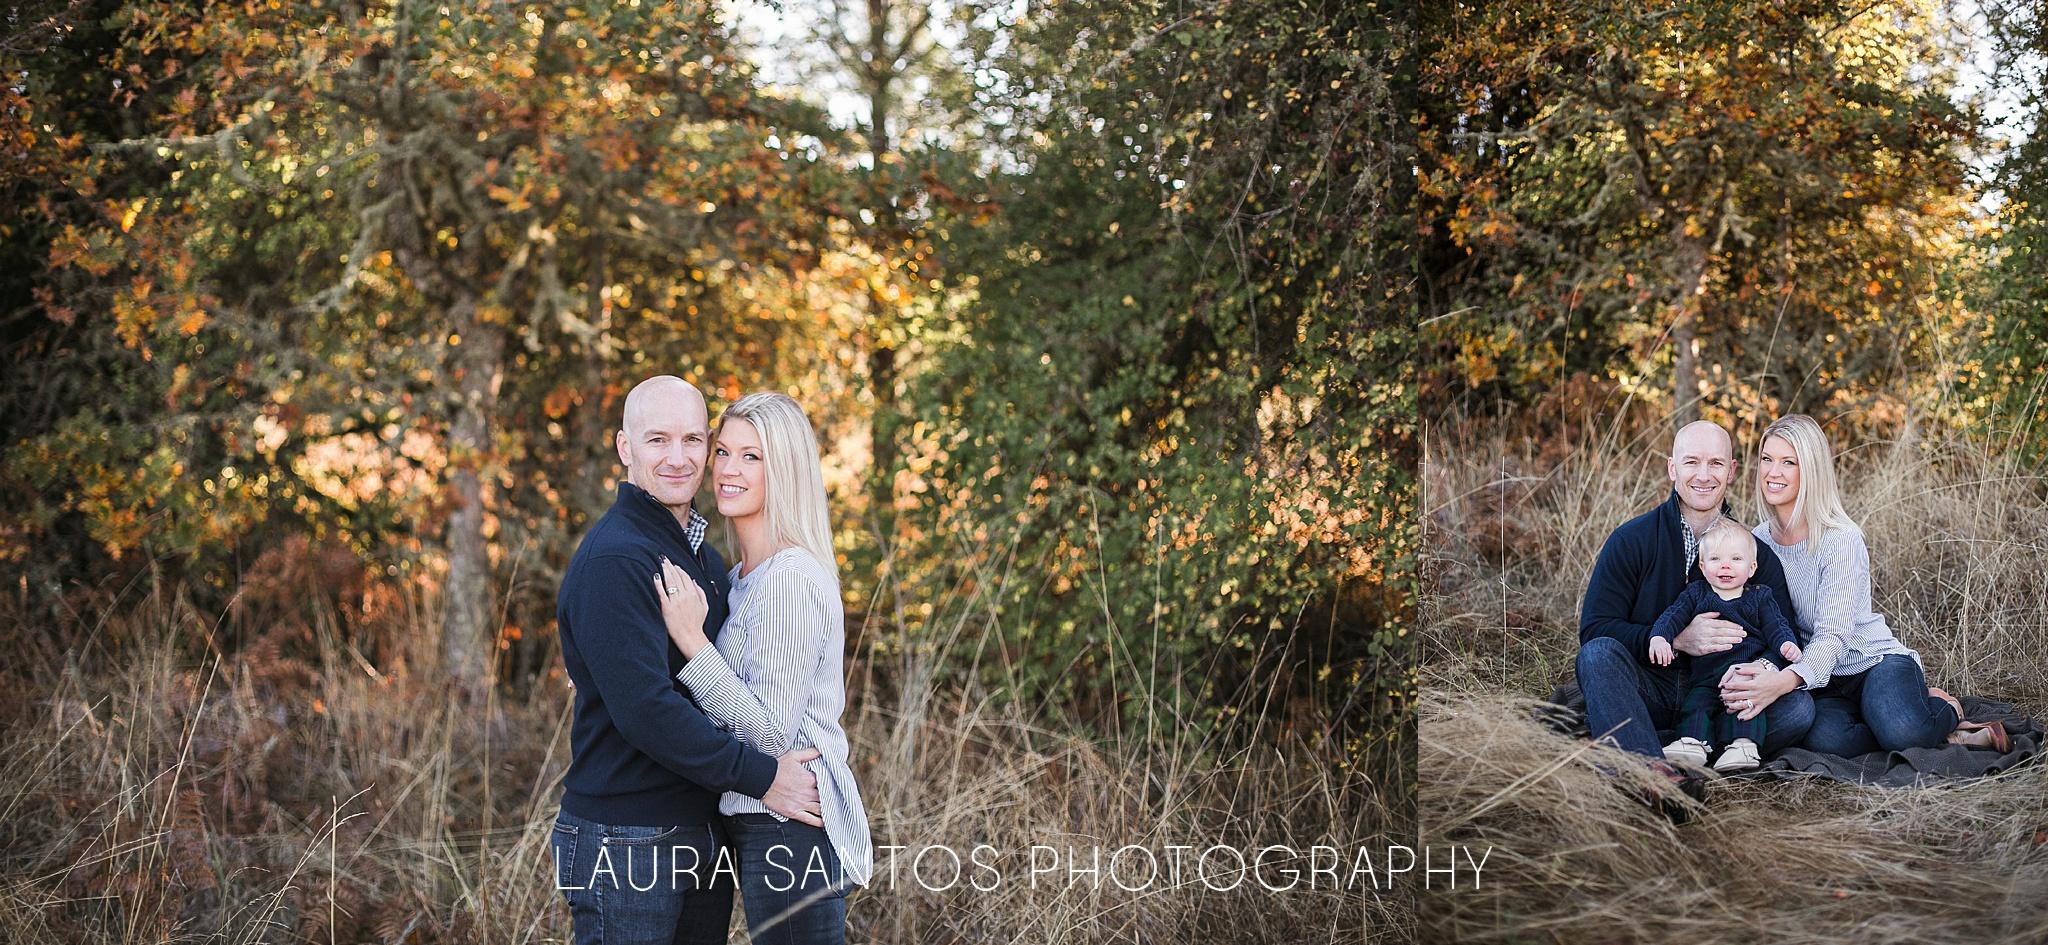 Laura Santos Photography Portland Oregon Family Photographer_0617.jpg